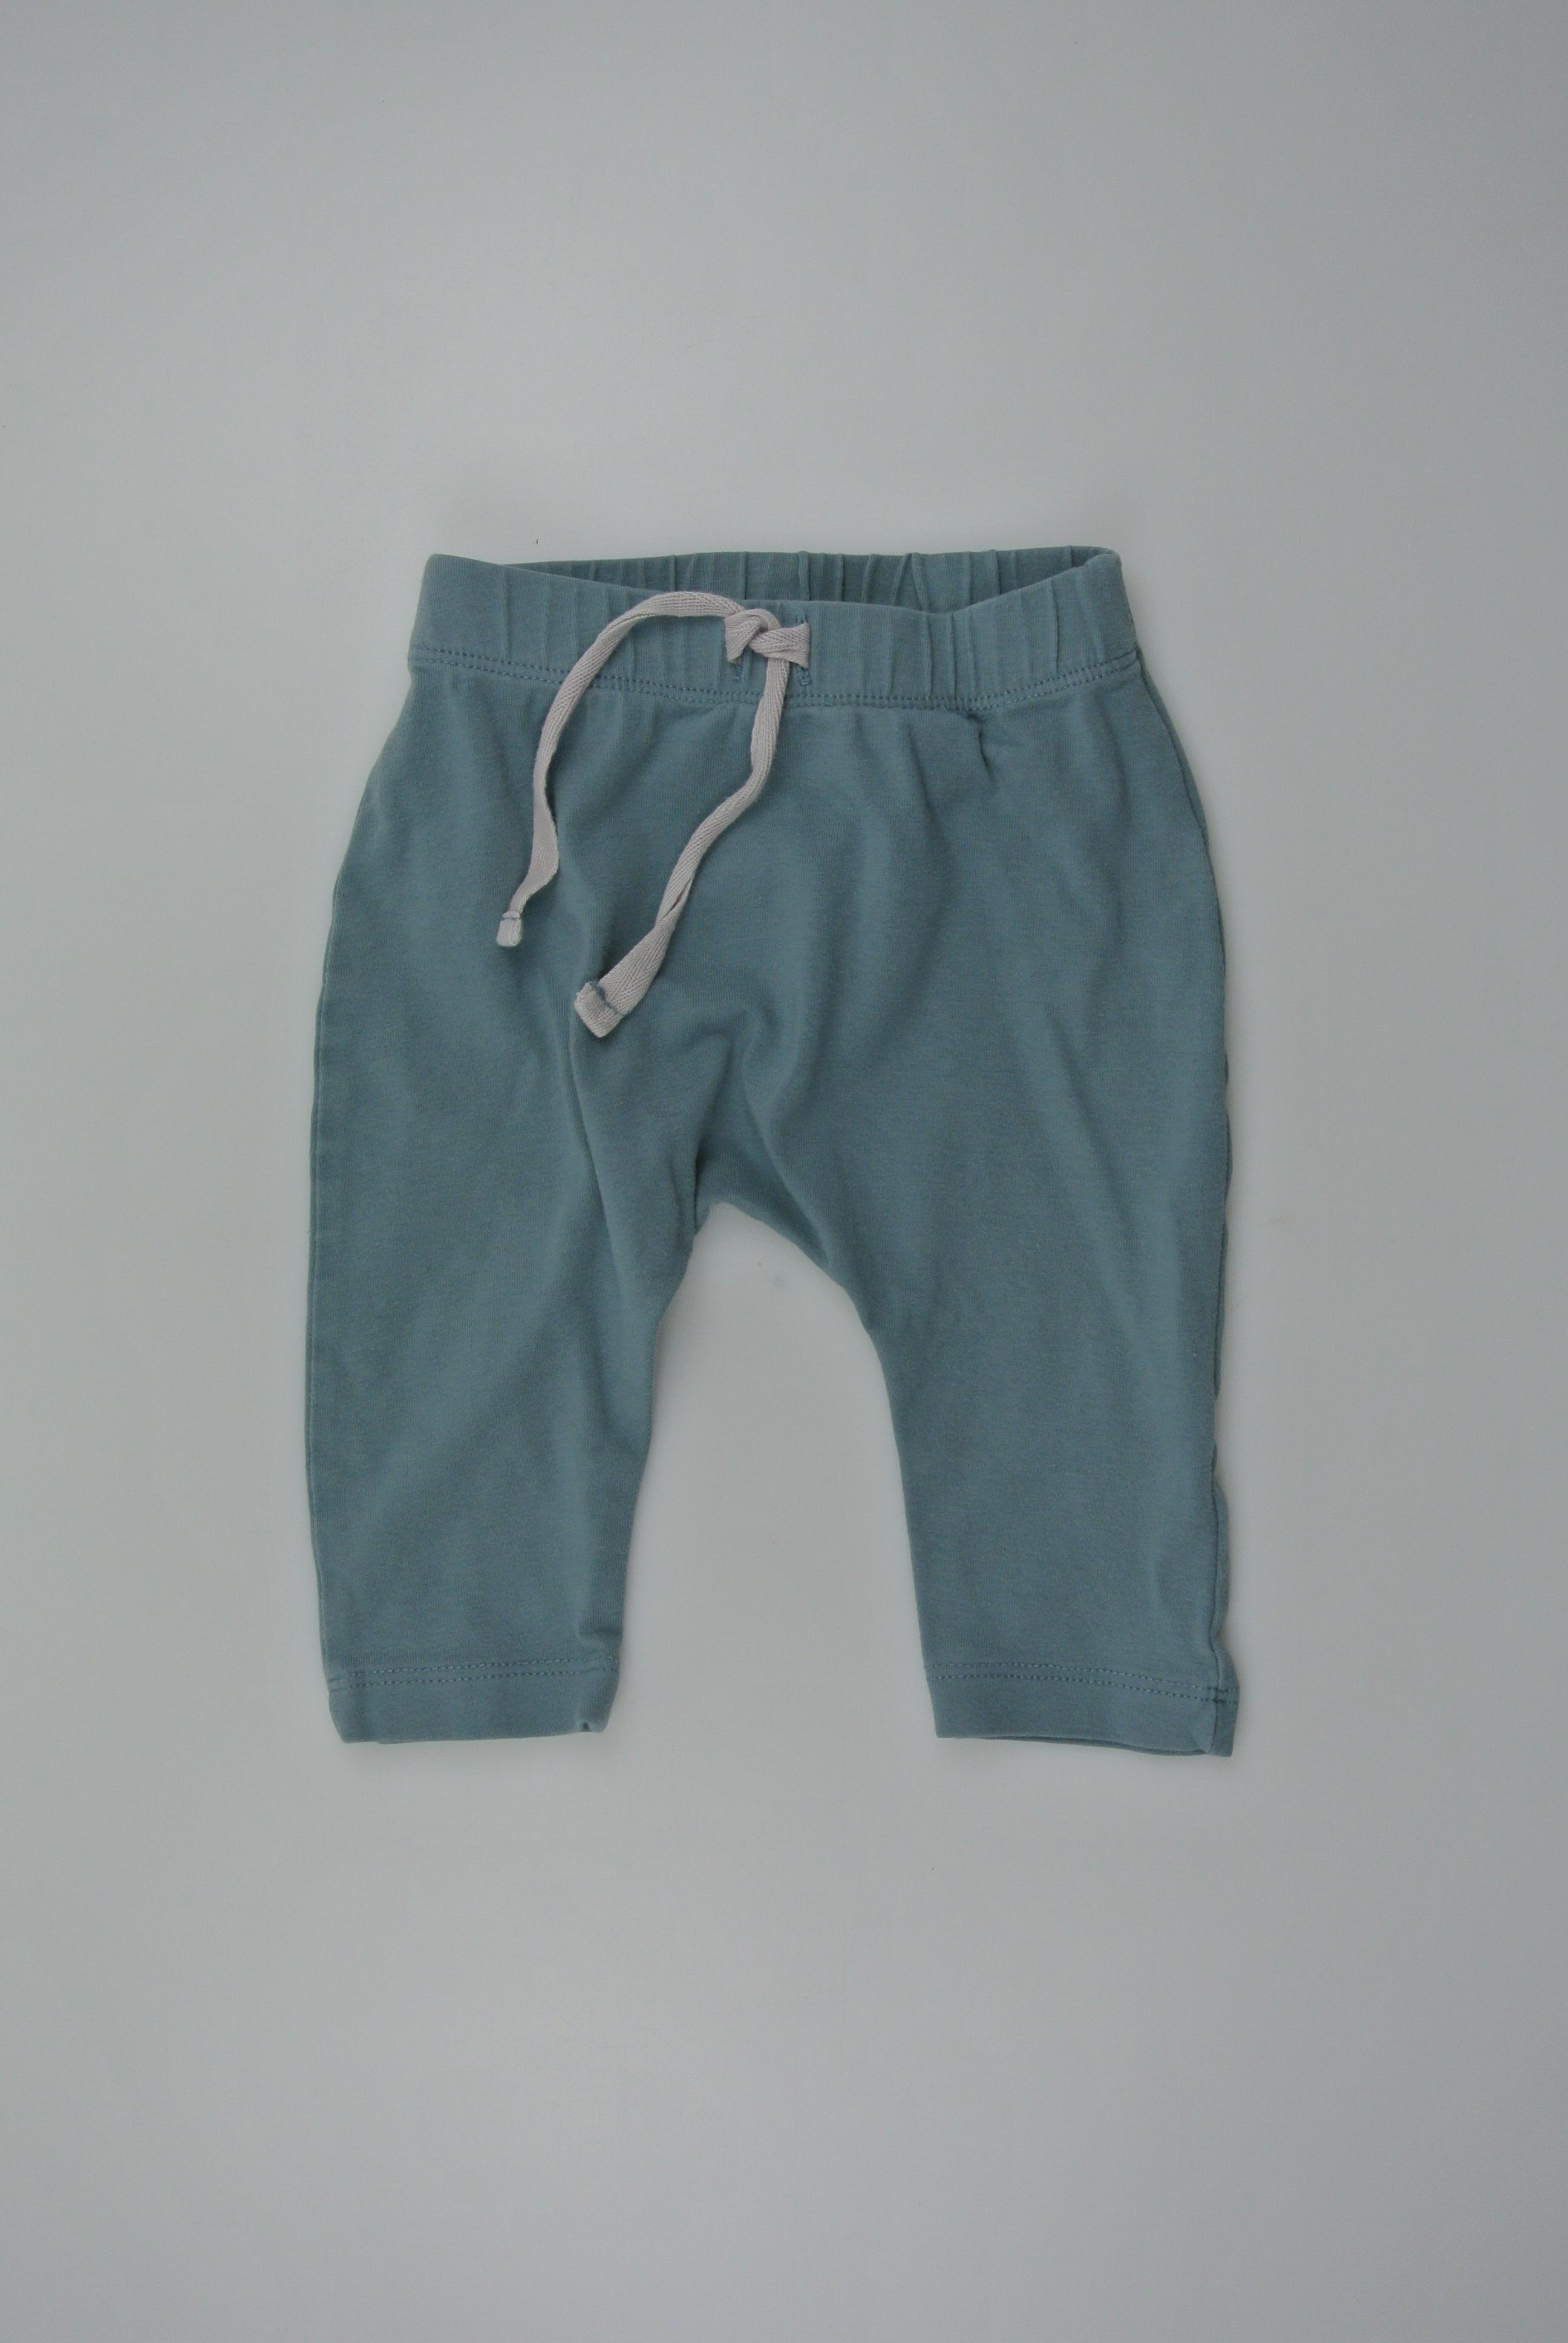 Marmar bukser str 62 dreng